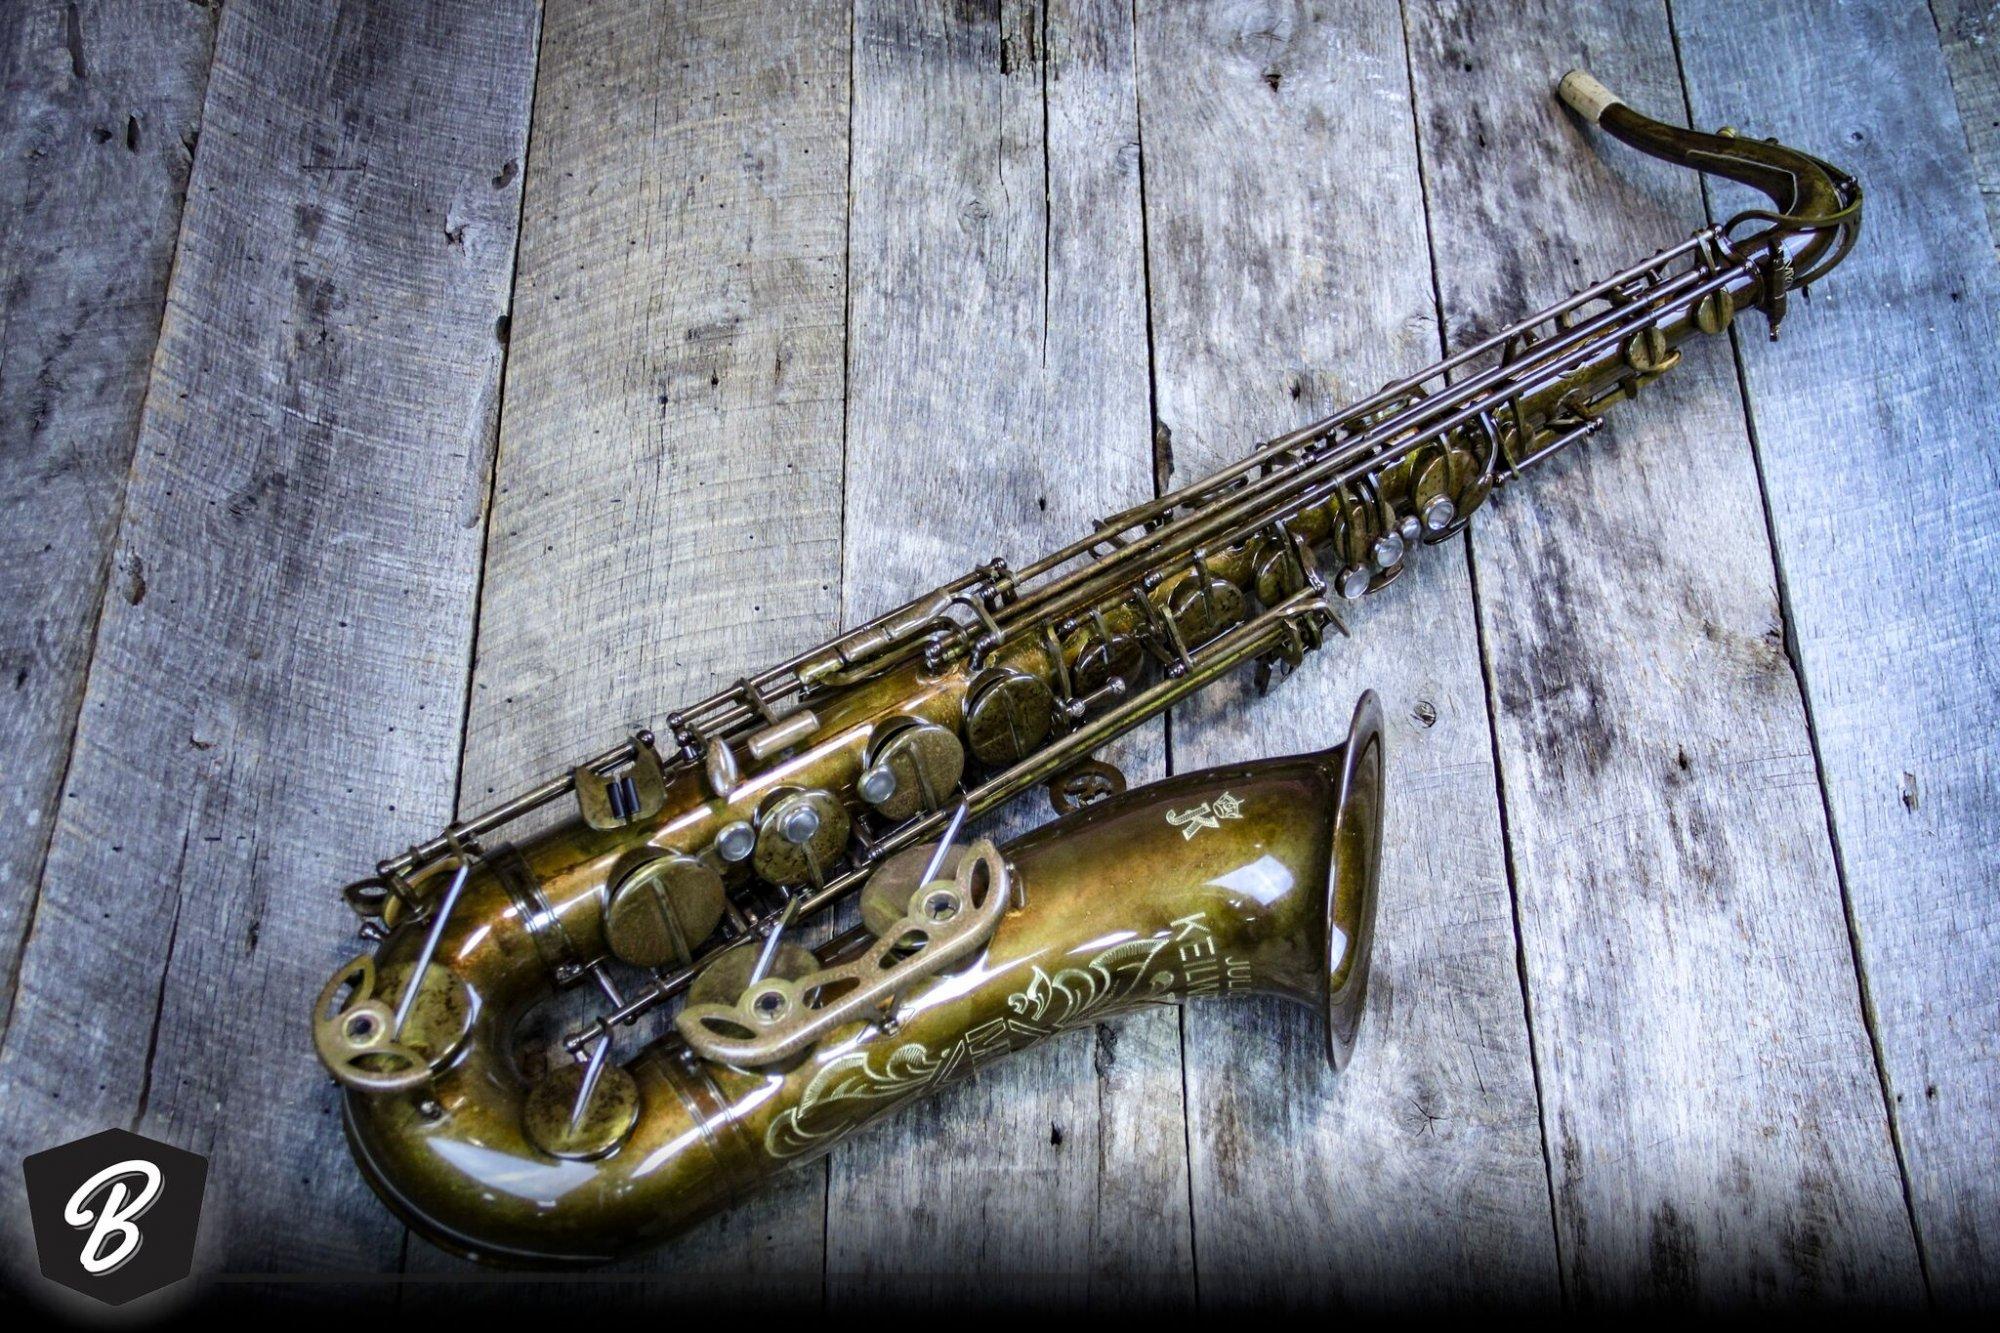 Julius Keilwerth MKX 3000 Tenor Saxophone